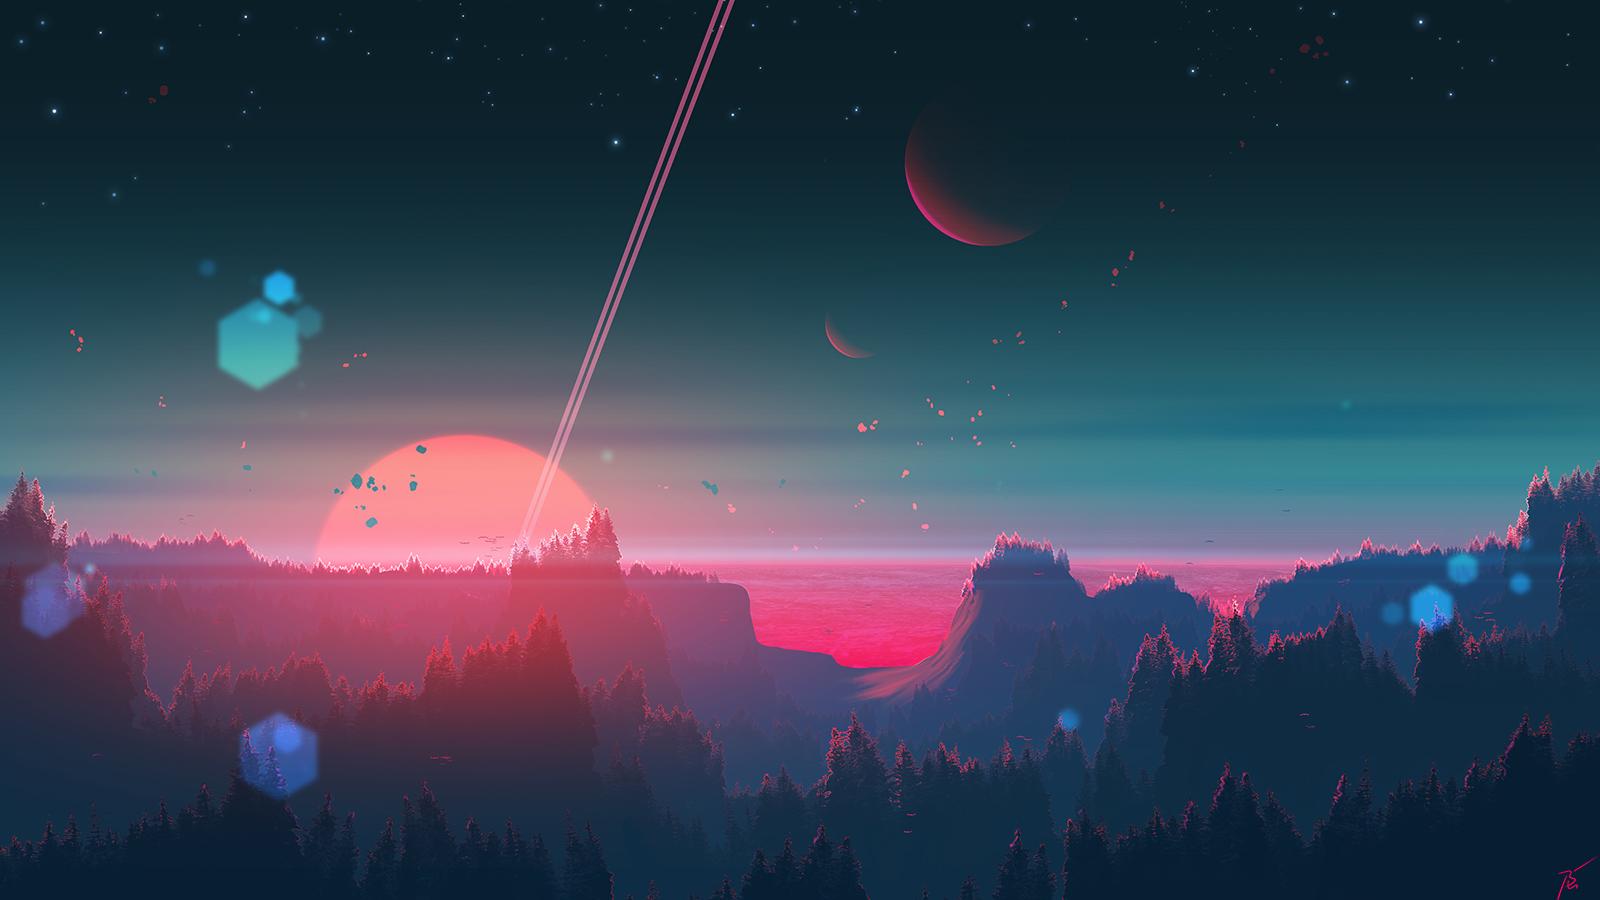 Under the strange horizon by JoeyJazz